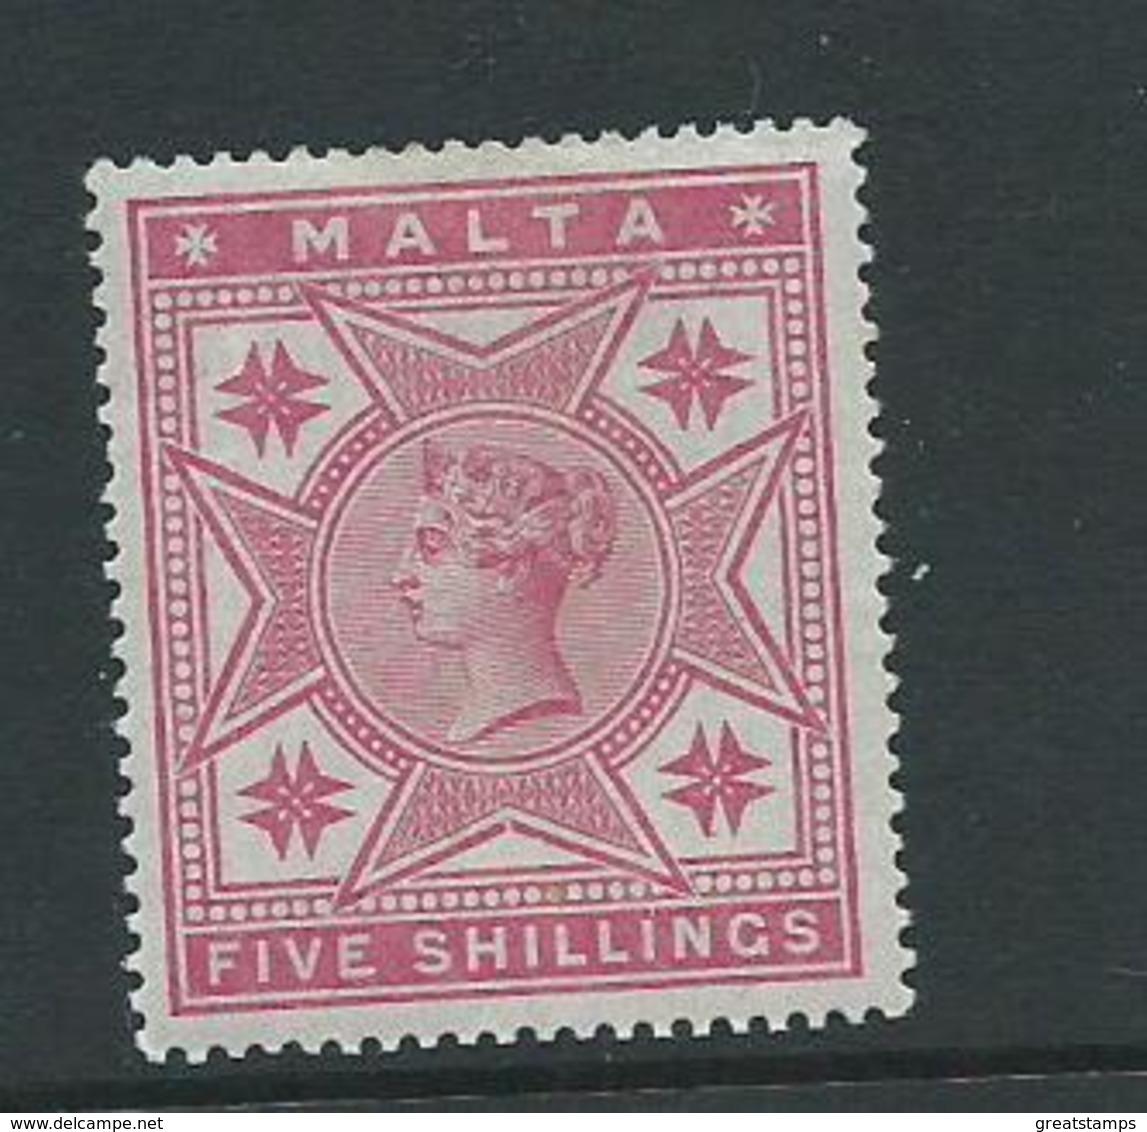 Malta Stamps Sg30 Hm Variety With Broken Cross At  Bottom 5/- - Malta